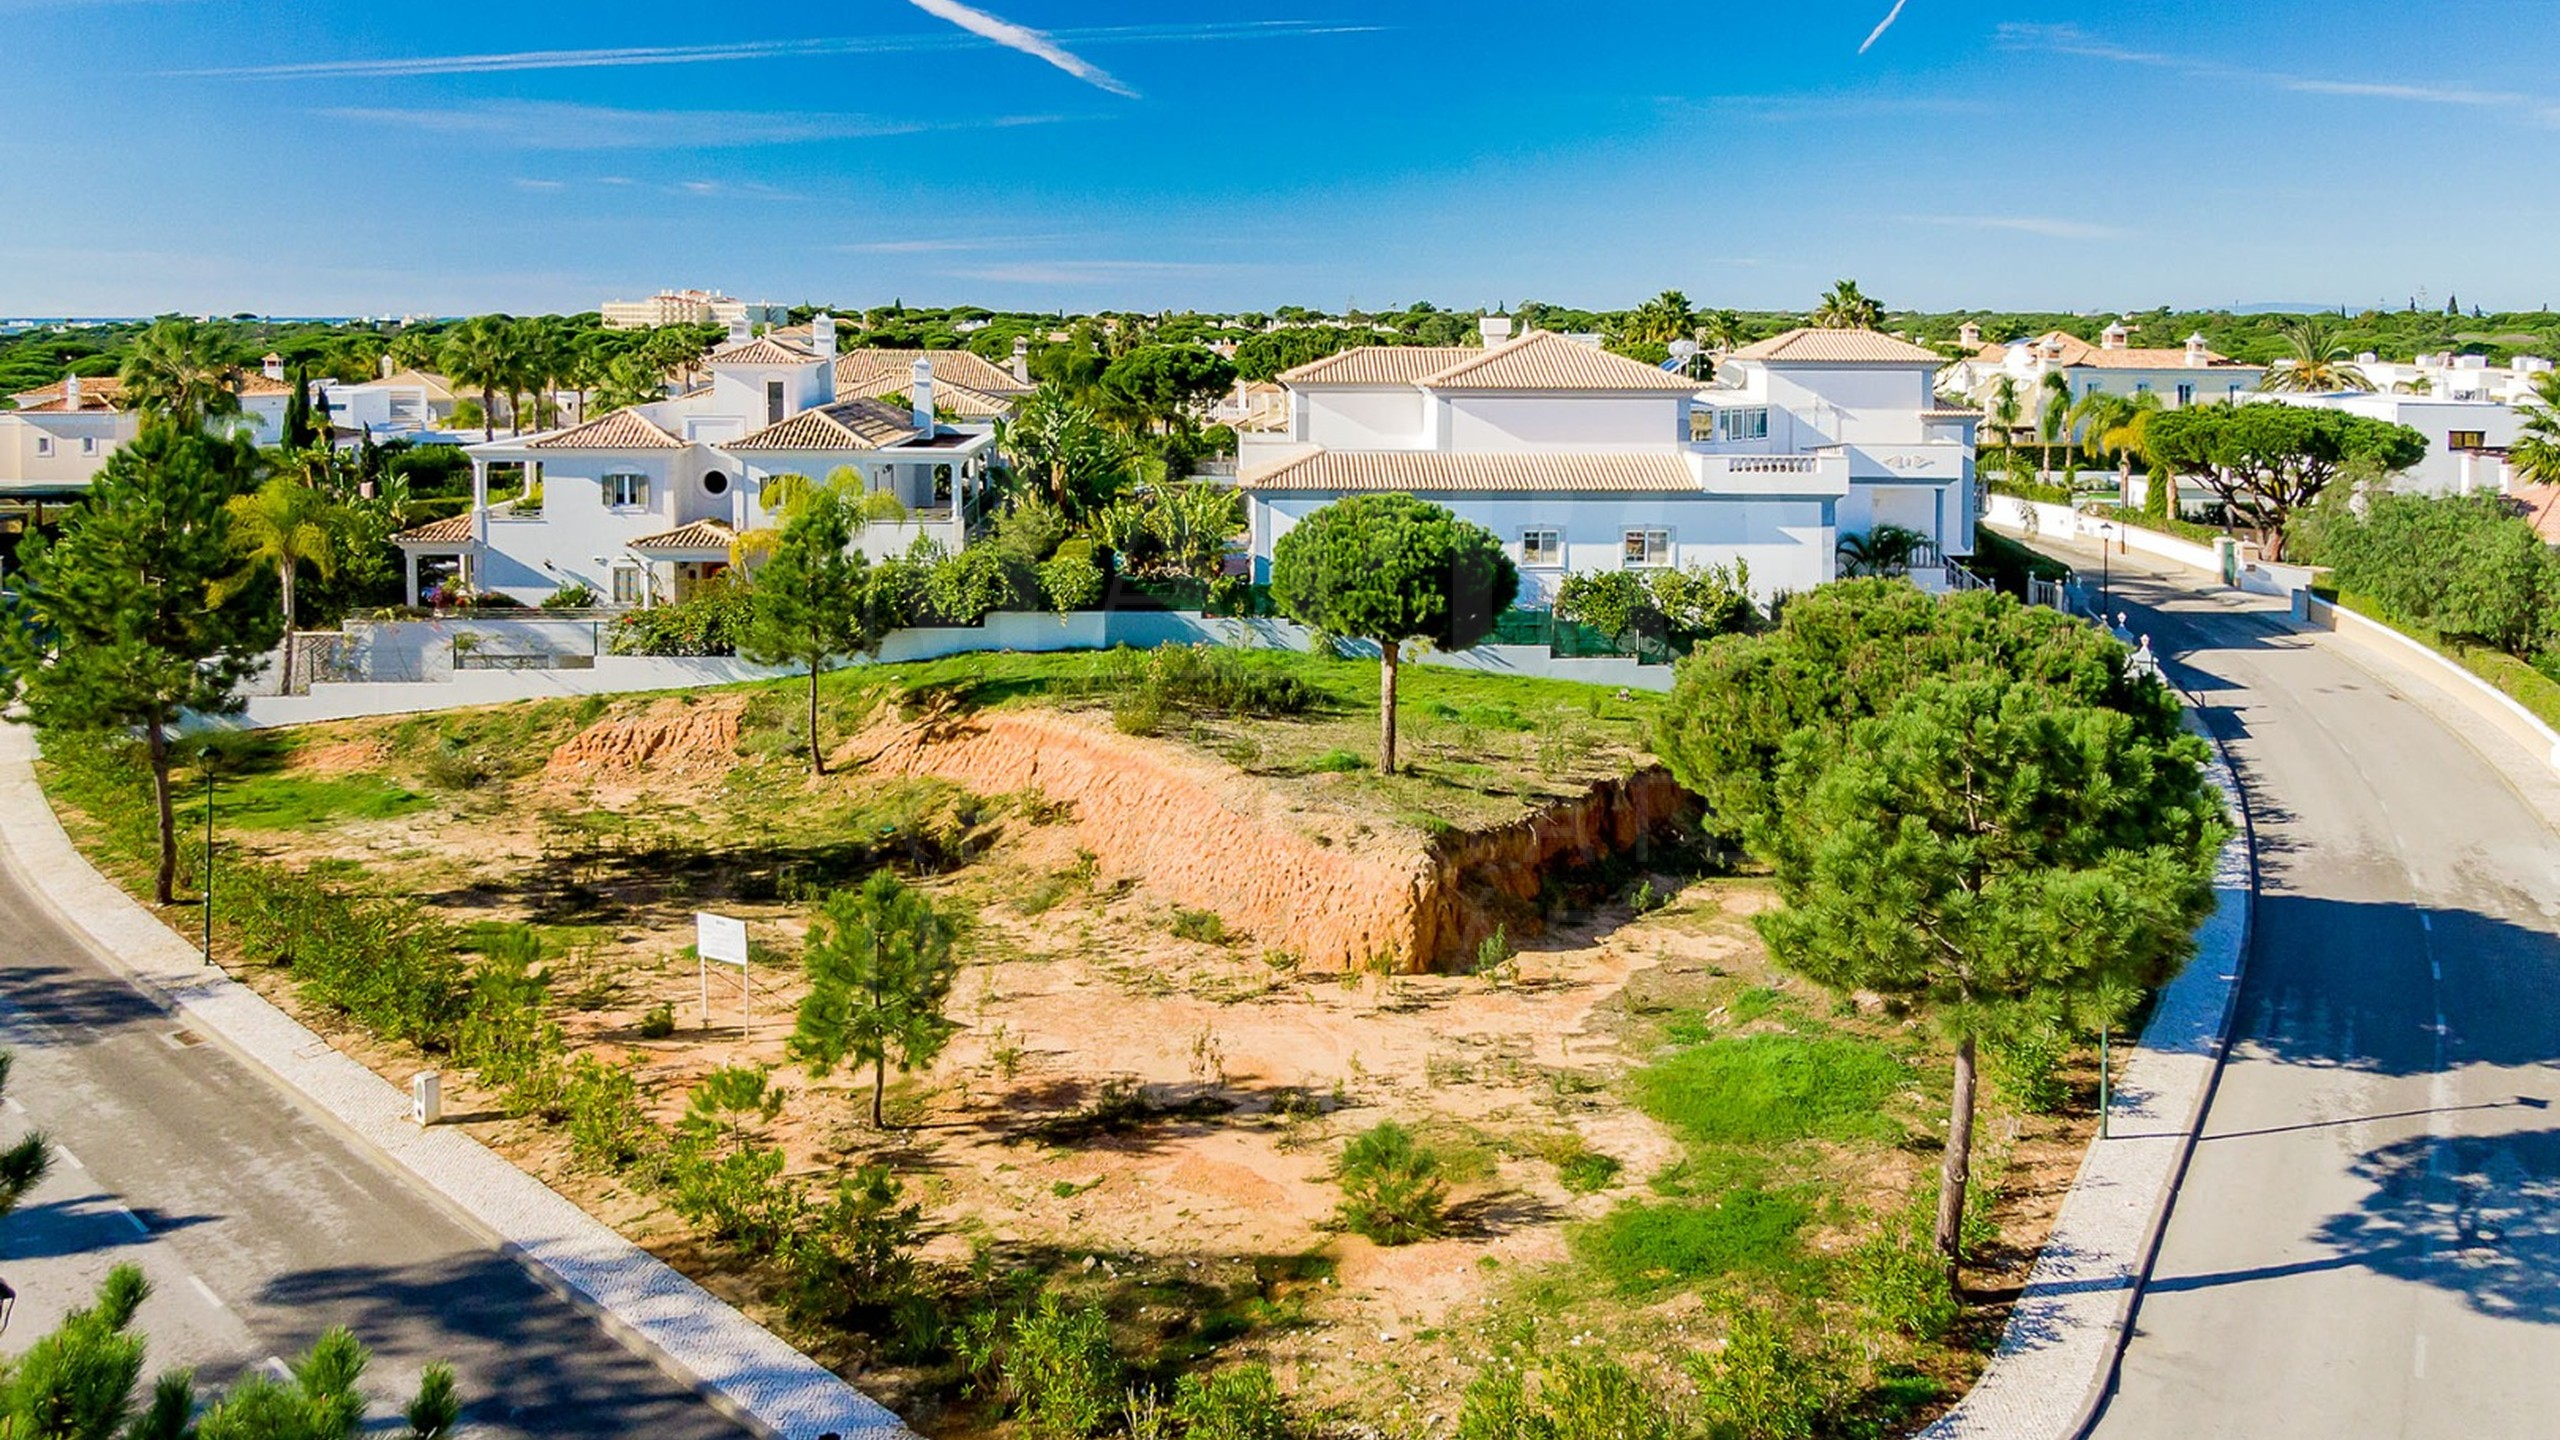 Terrain constructible à vendre au Portugal